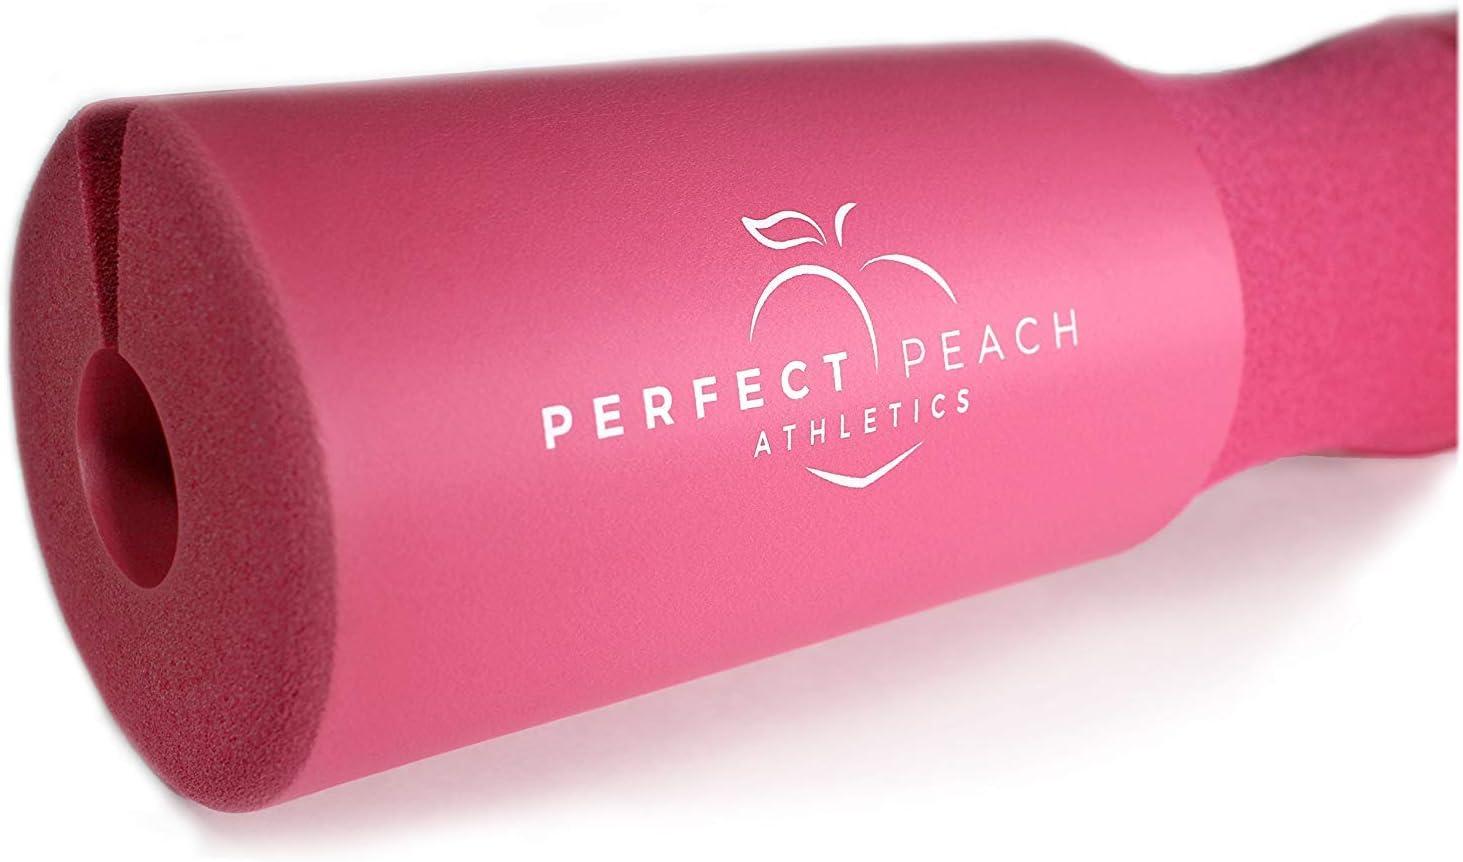 Perfect Peach Athletics Squat Pad Barbell Pad - Hip Thruster Foam Squat Bar Neck Pad for Women Weight Lifting Equipment